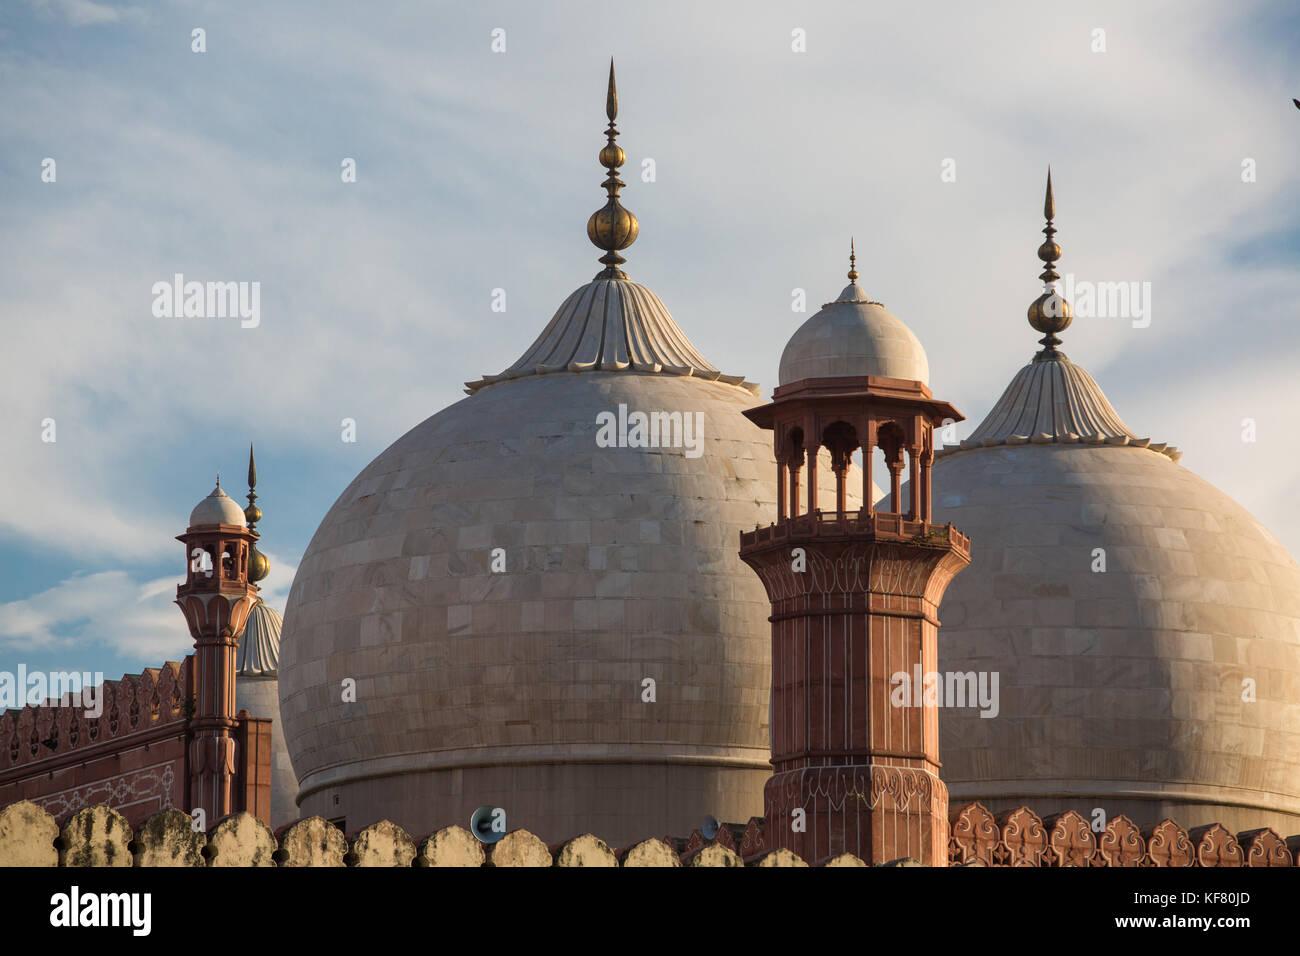 The Emperor's Mosque - Badshahi Masjid in Lahore, Pakistan Dome with Minarets Closeup - Stock Image